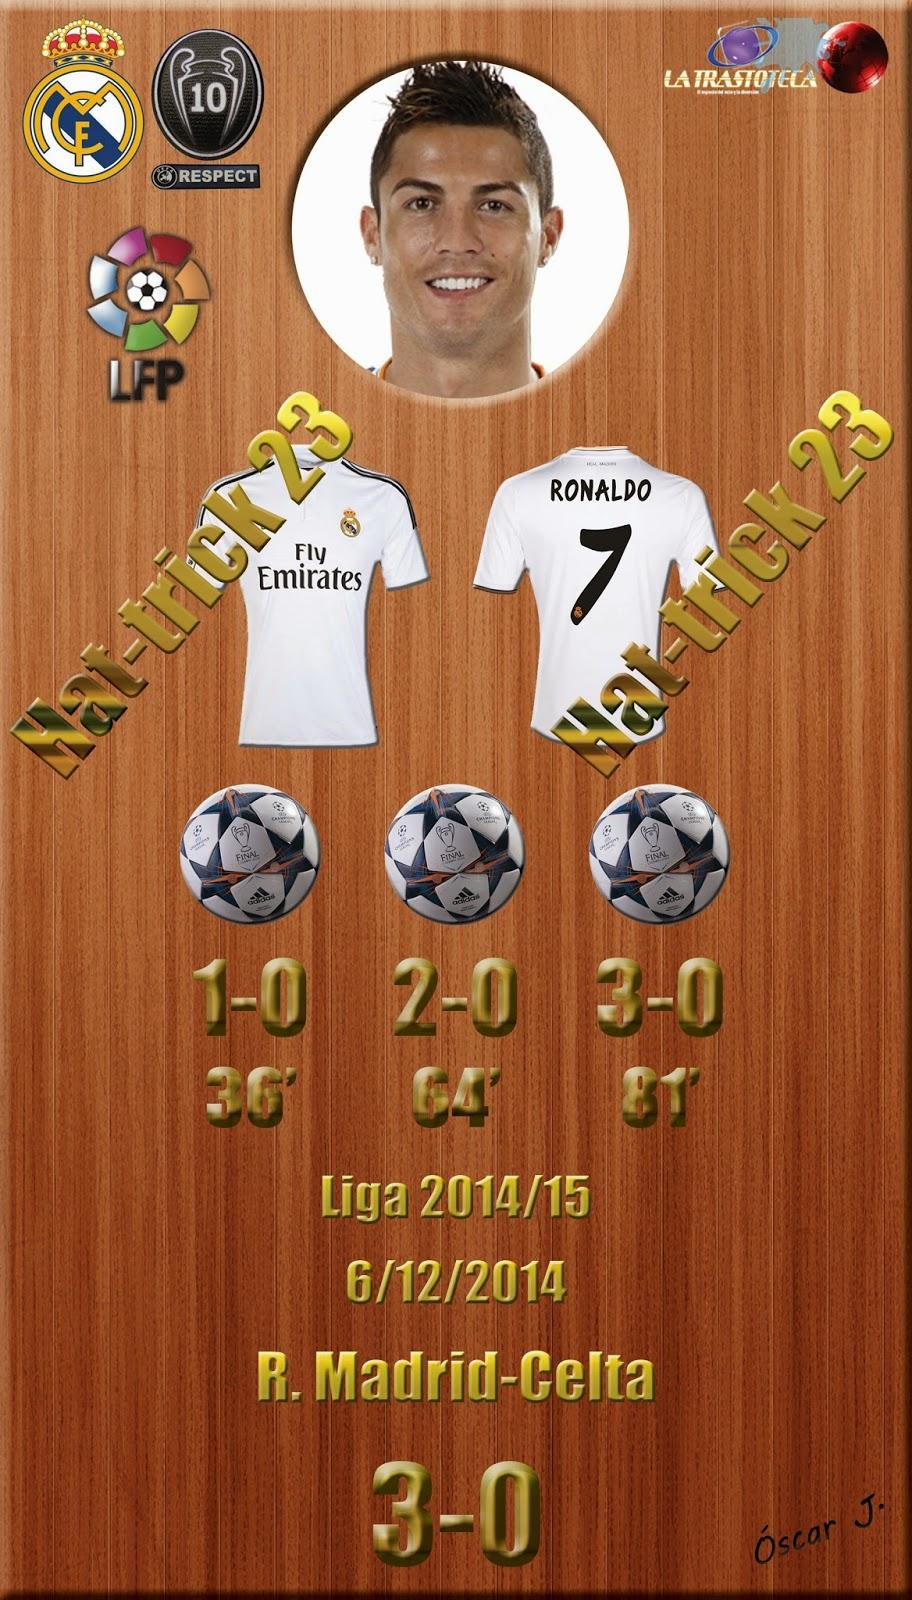 Real Madrid 3-0 Celta - Liga 2014/15 - Jornada 14 - (6/12/2014). Cristiano Ronaldo - Hat-Trick Nº 23 - Cristiano Ronaldo supera el récord de Di Stéfano y Zarra.